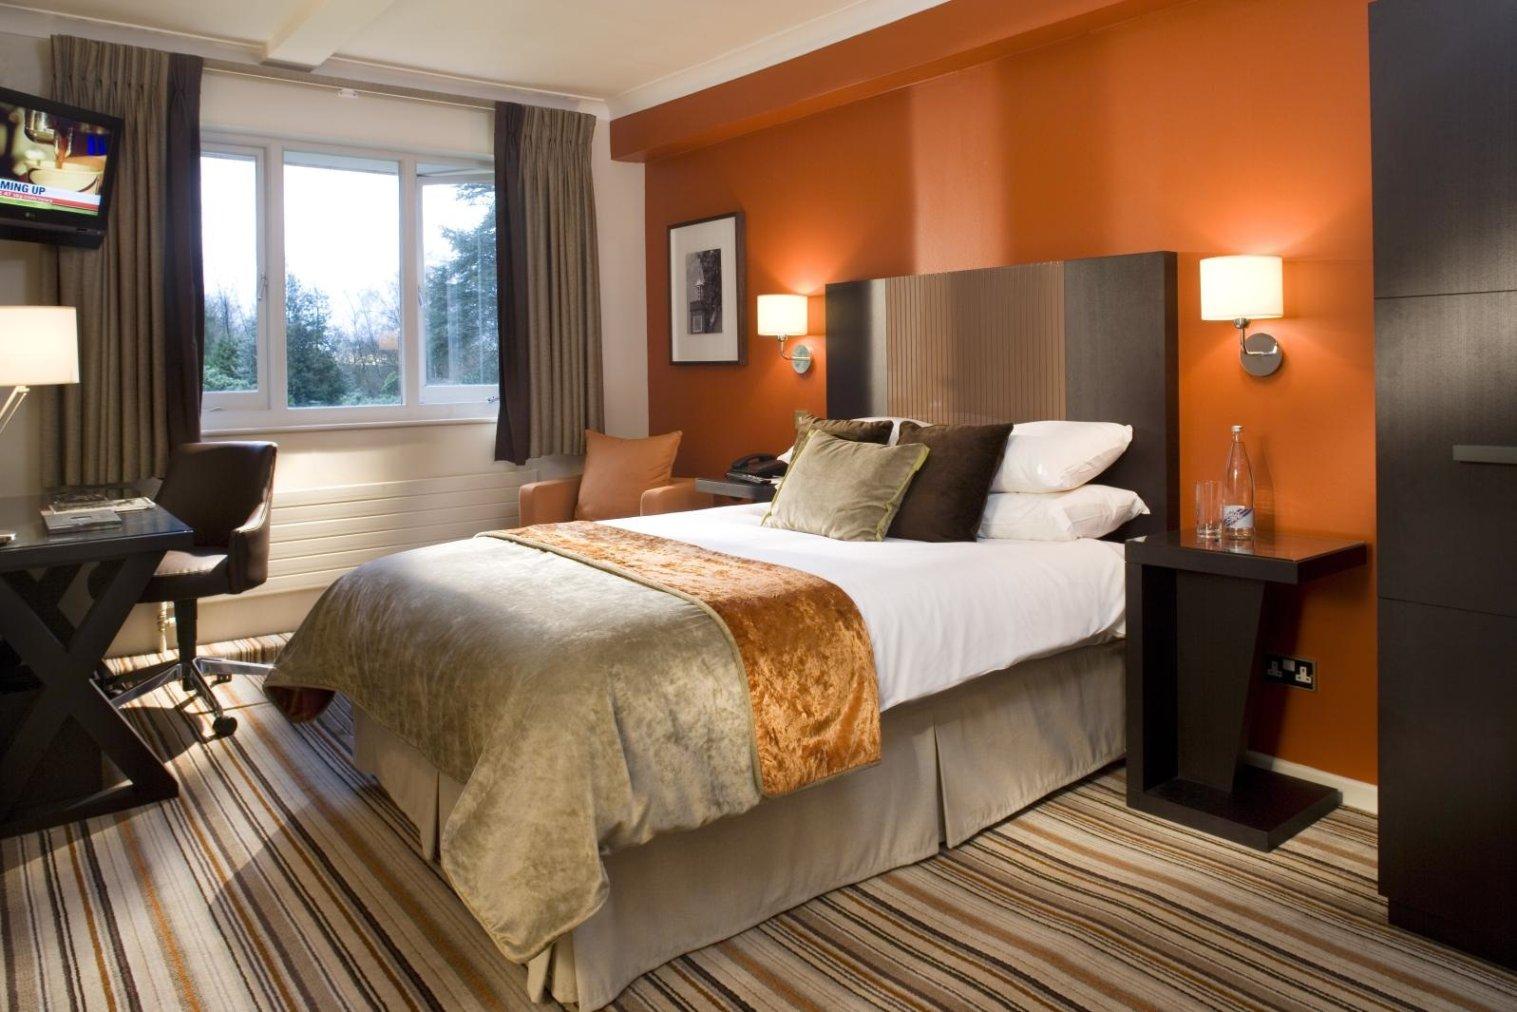 warm bedroom colors photo - 2